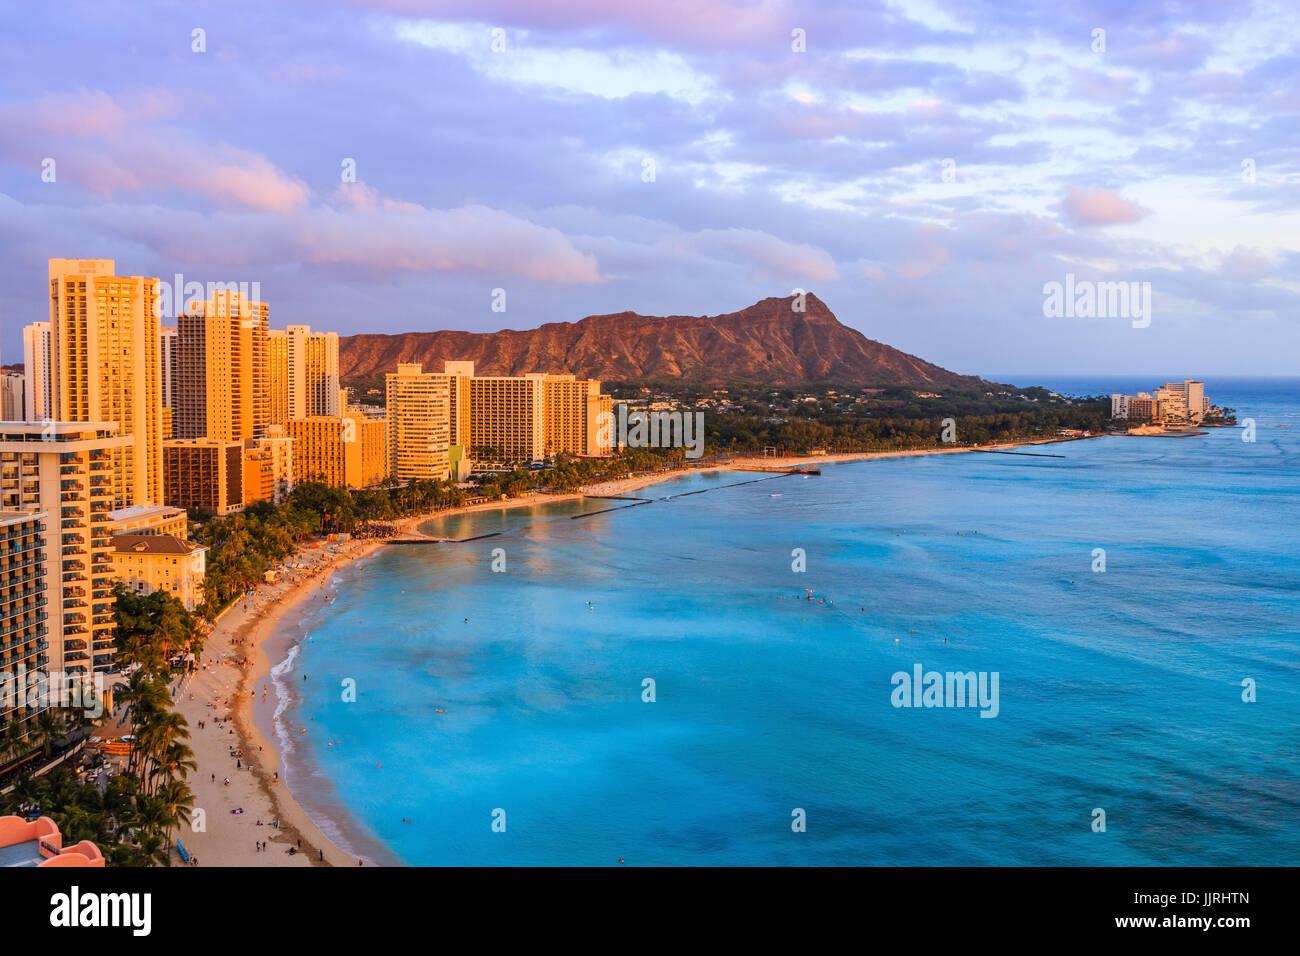 Honolulu Hawaii Skyline Of Diamond Head Volcano Including The Hotels And Buildings On Waikiki Beach